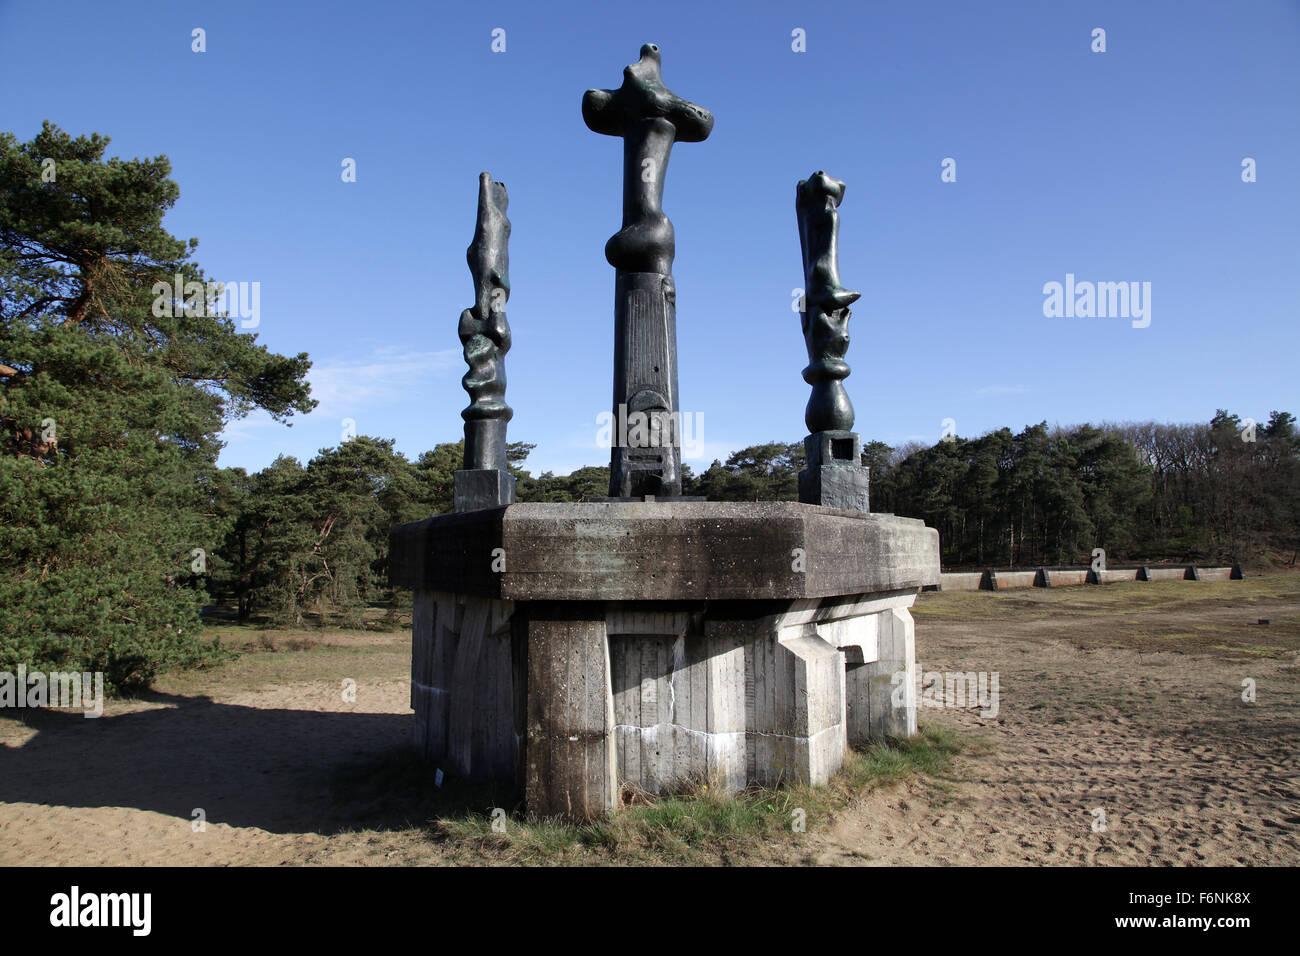 Three upright motives by Henry Moore Arnhem Netherlands - Stock Image